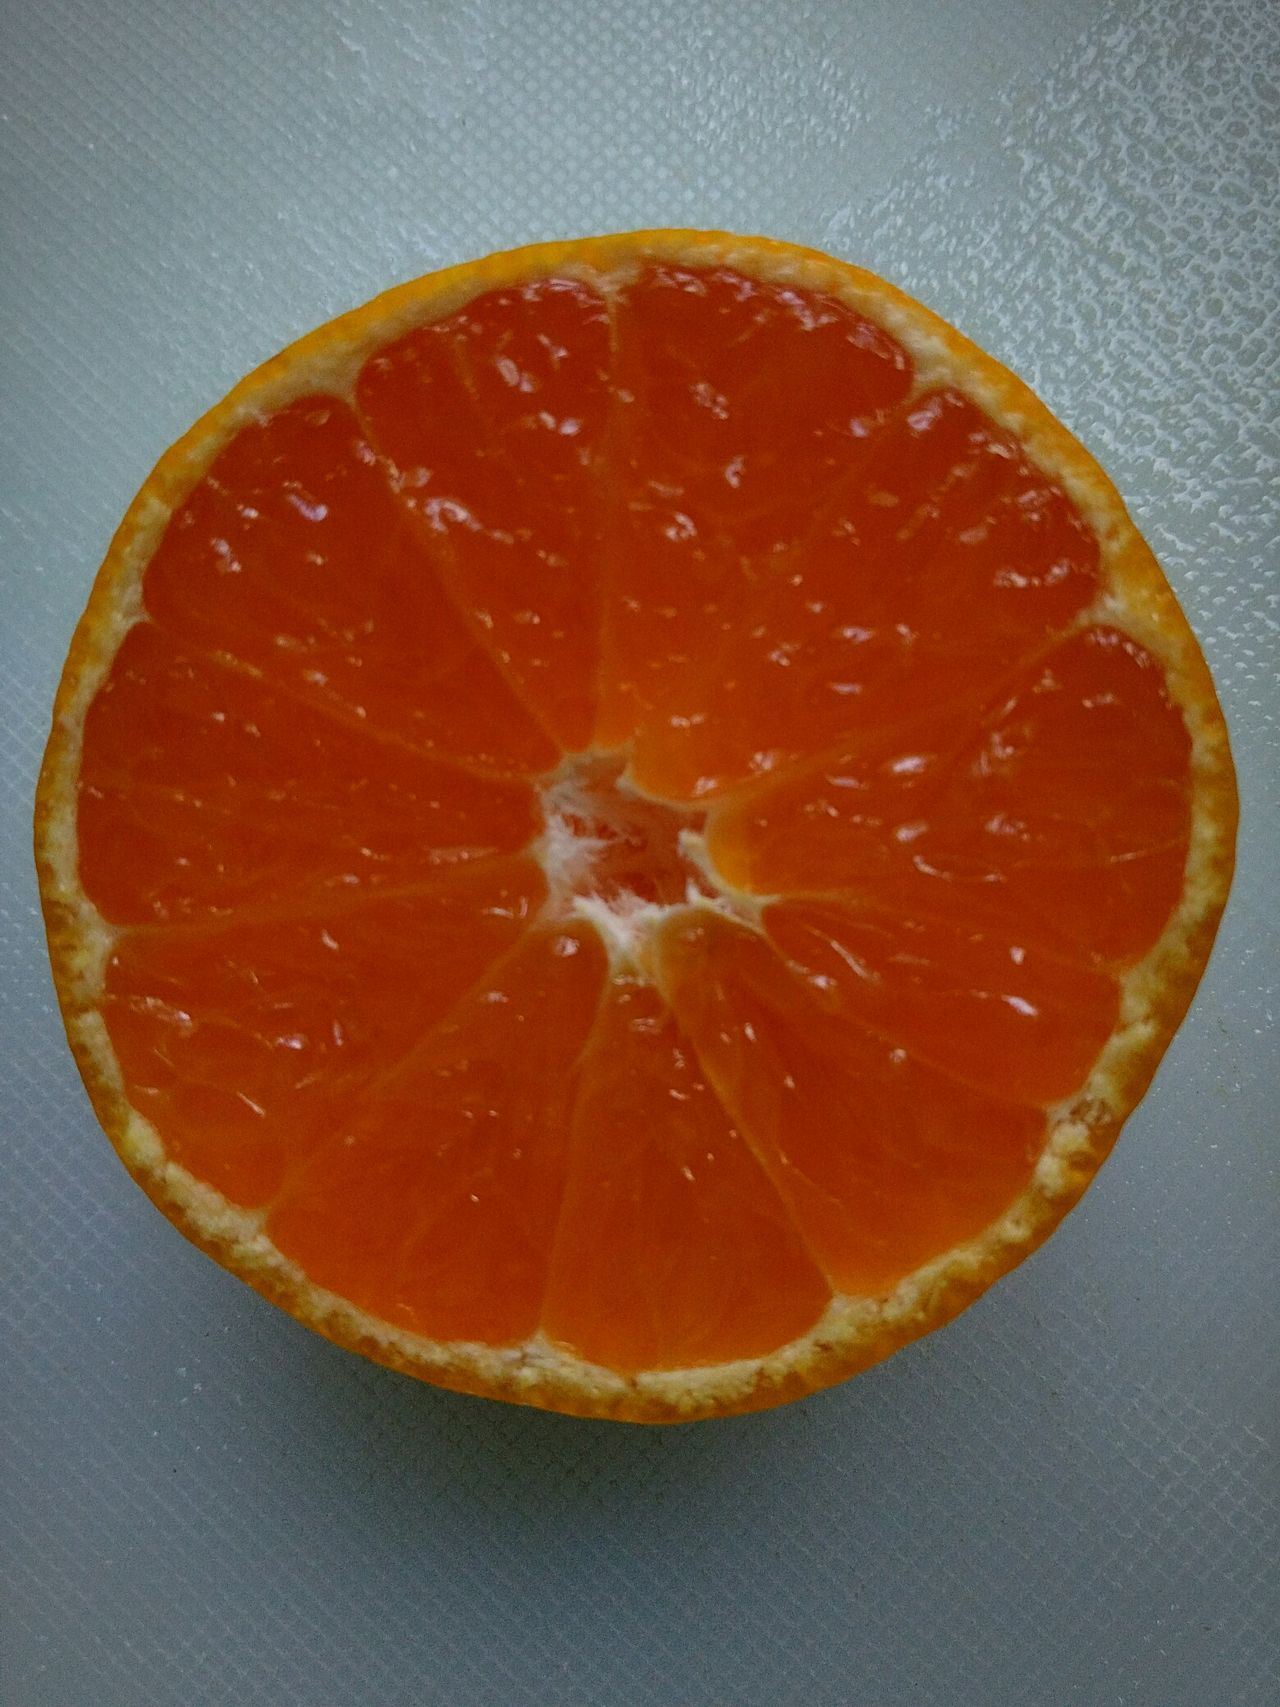 Orange.. Fruit Citrus Fruit SLICE Orange - Fruit Healthy Eating Juicy Cross Section Close-up Food Studio Shot Freshness No People Blood Orange Grapefruit Sweet Food Halved Indoors  Sour Taste White Background